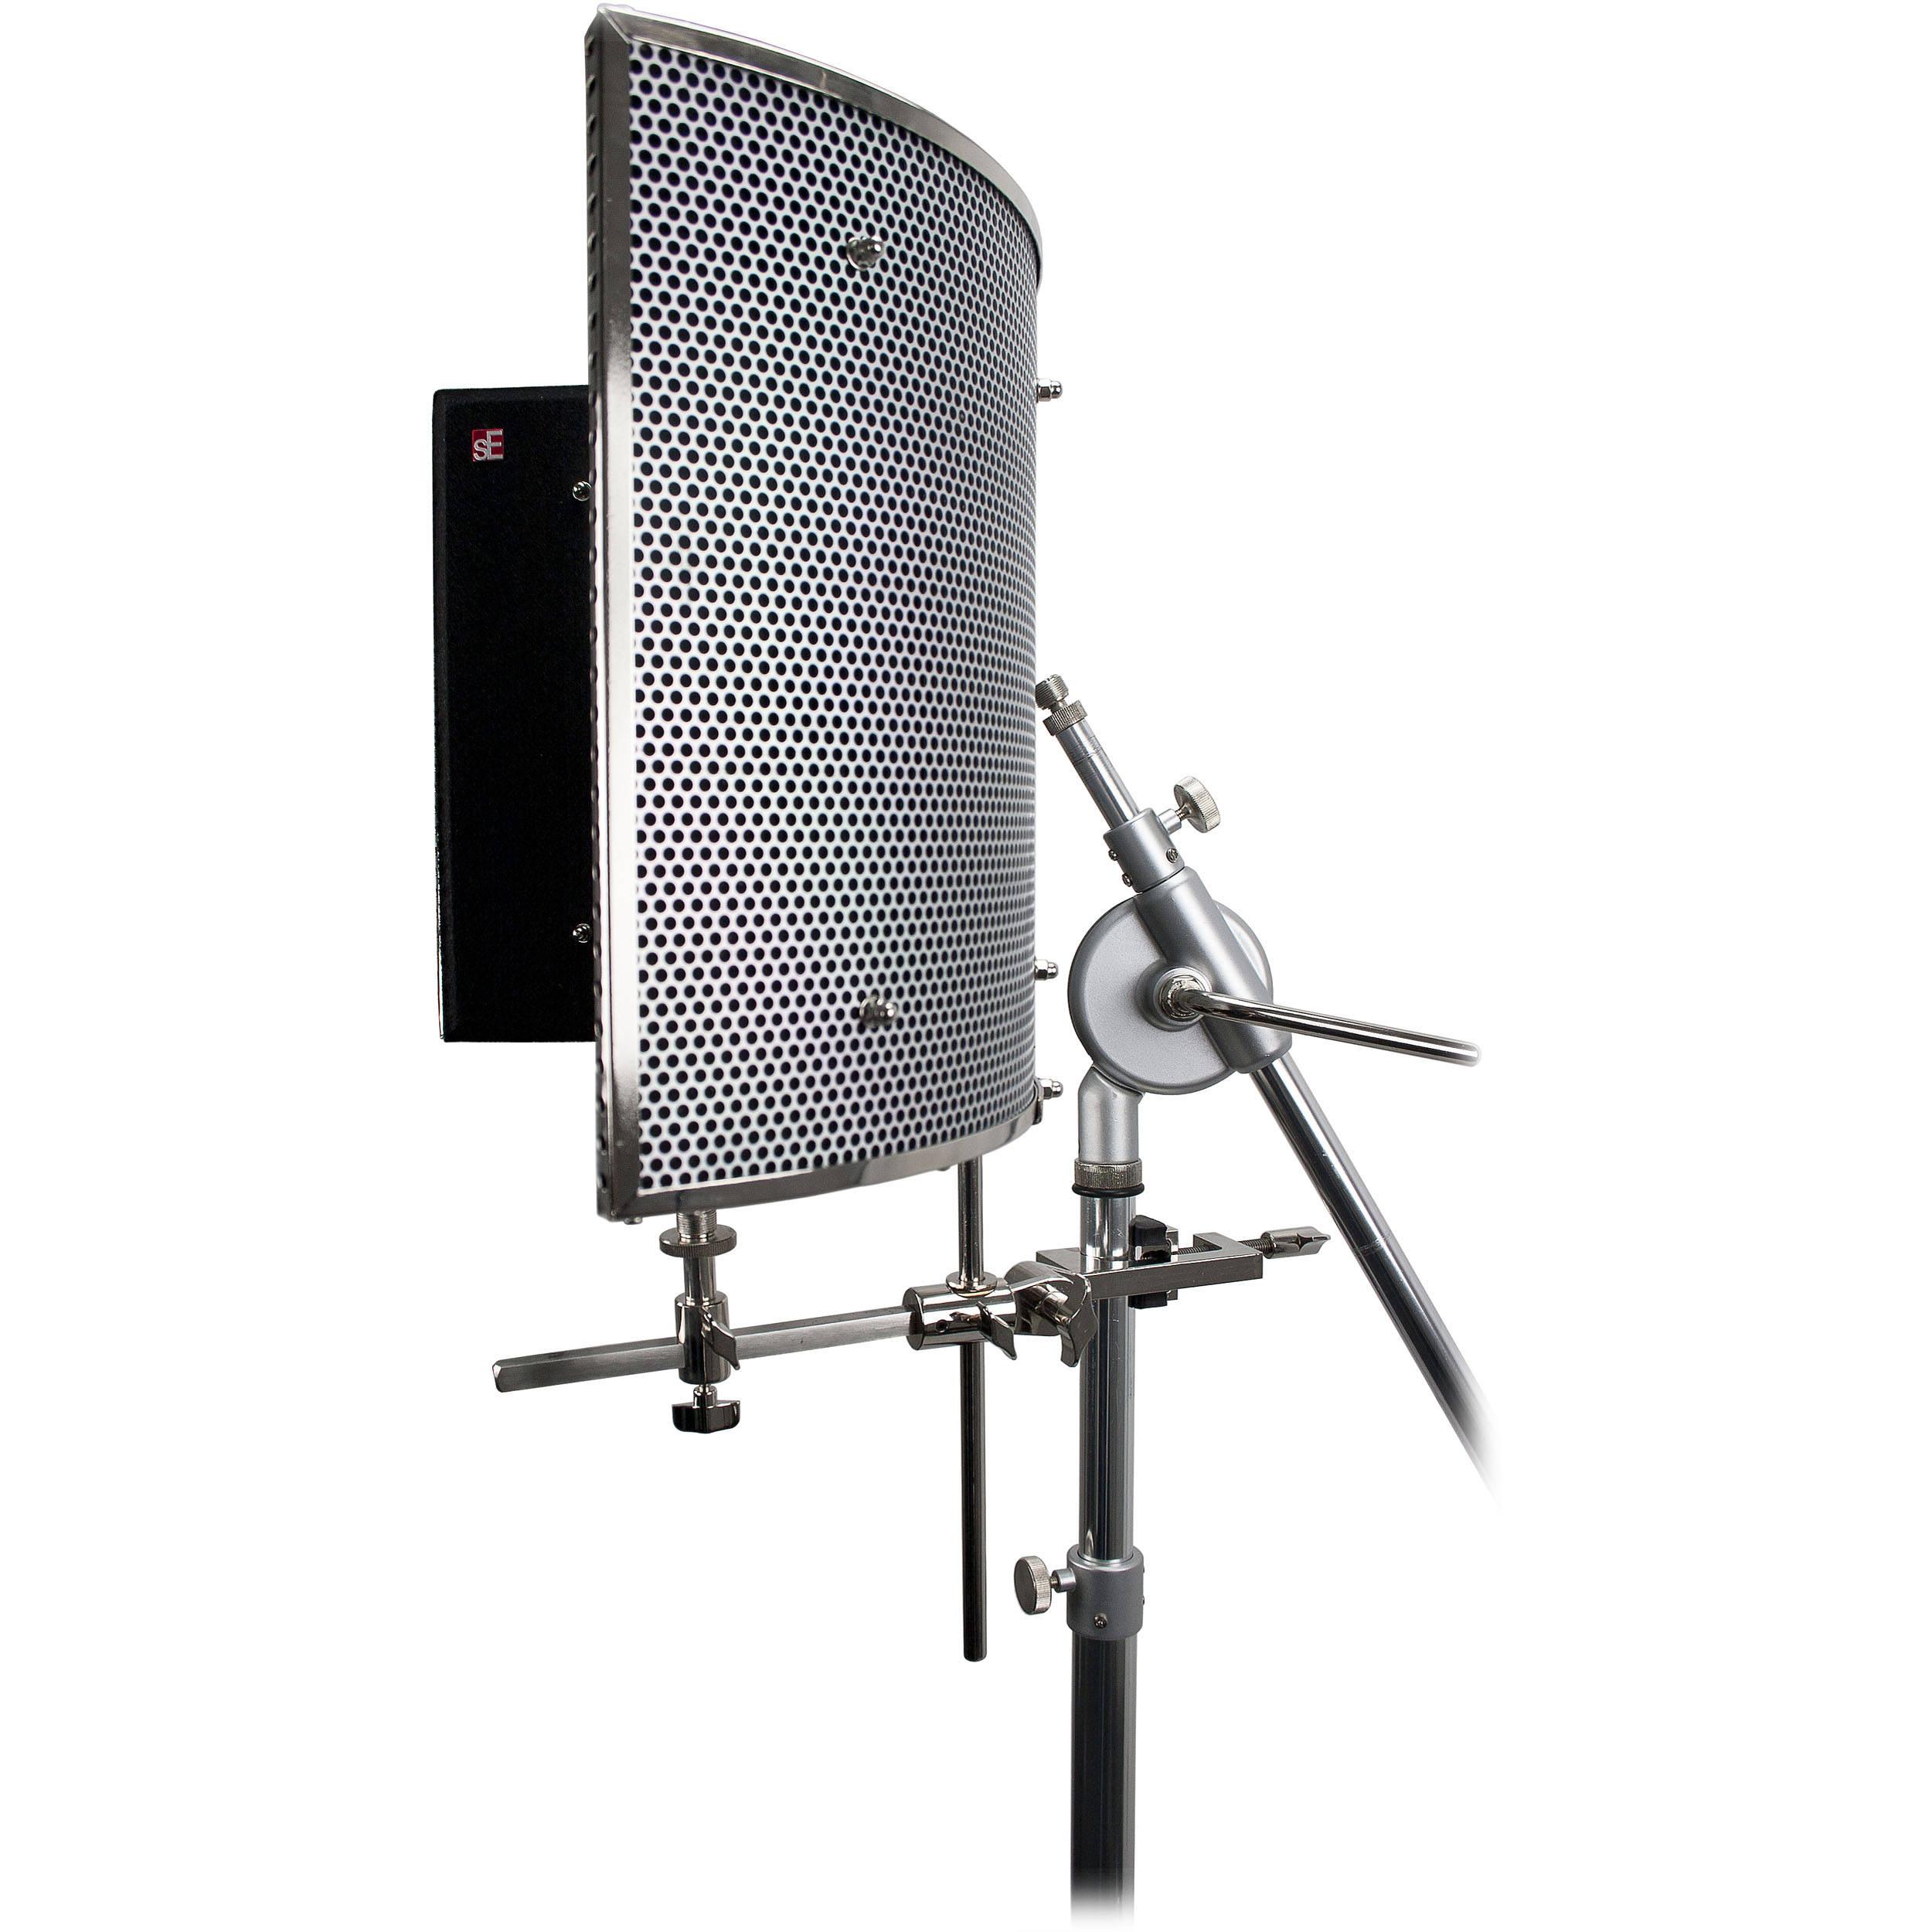 se electronics reflexion filter pro acoustic absorber see rf. Black Bedroom Furniture Sets. Home Design Ideas